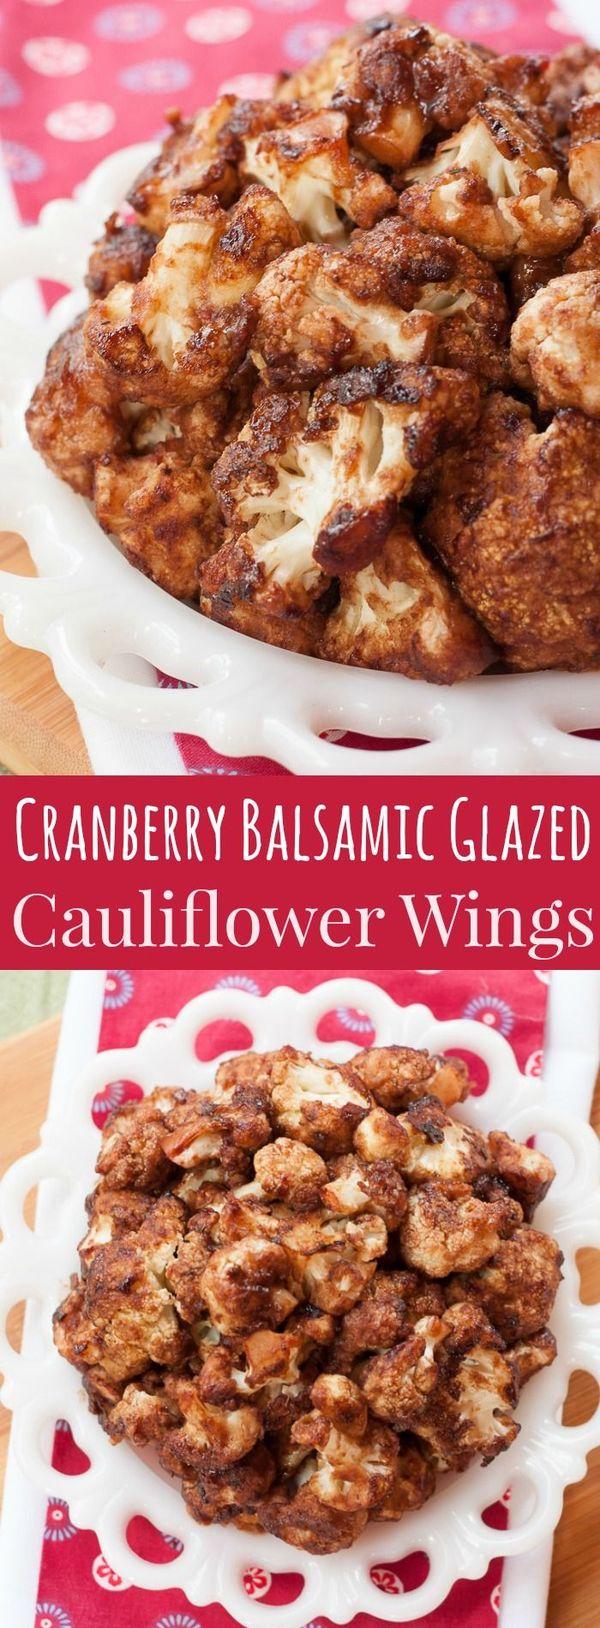 Cranberry Balsamic Glazed Cauliflower Wings for #SundaySupper